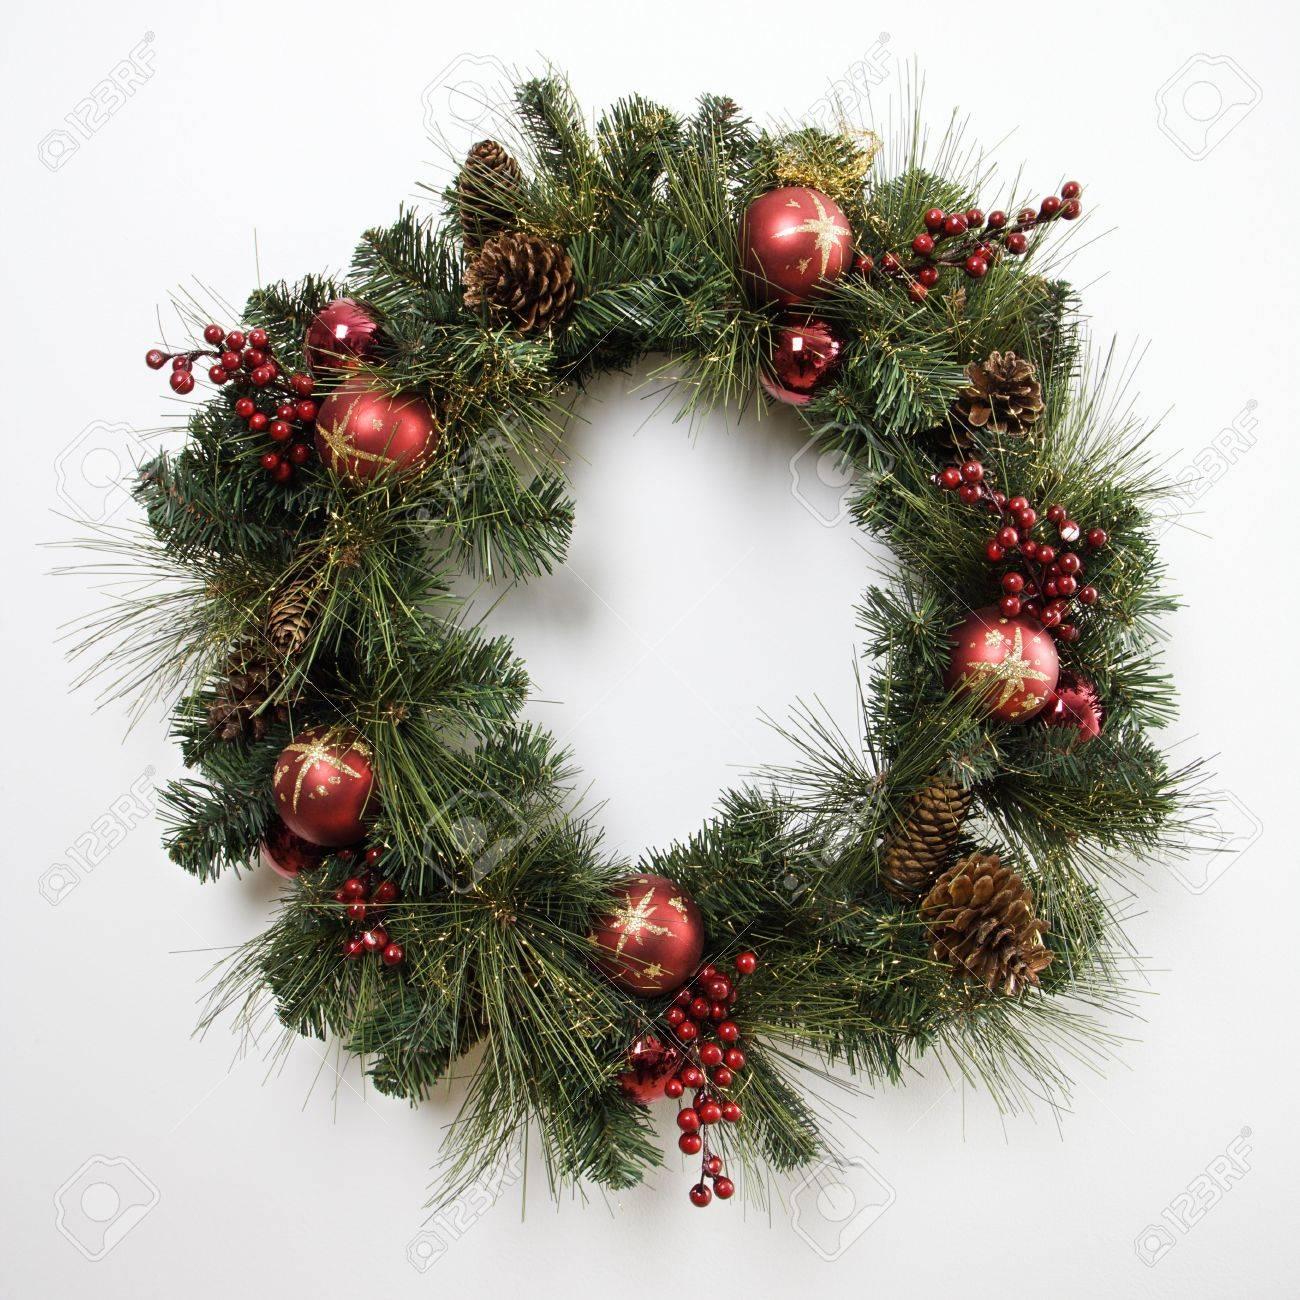 Still life of Christmas wreath. Stock Photo - 2175947